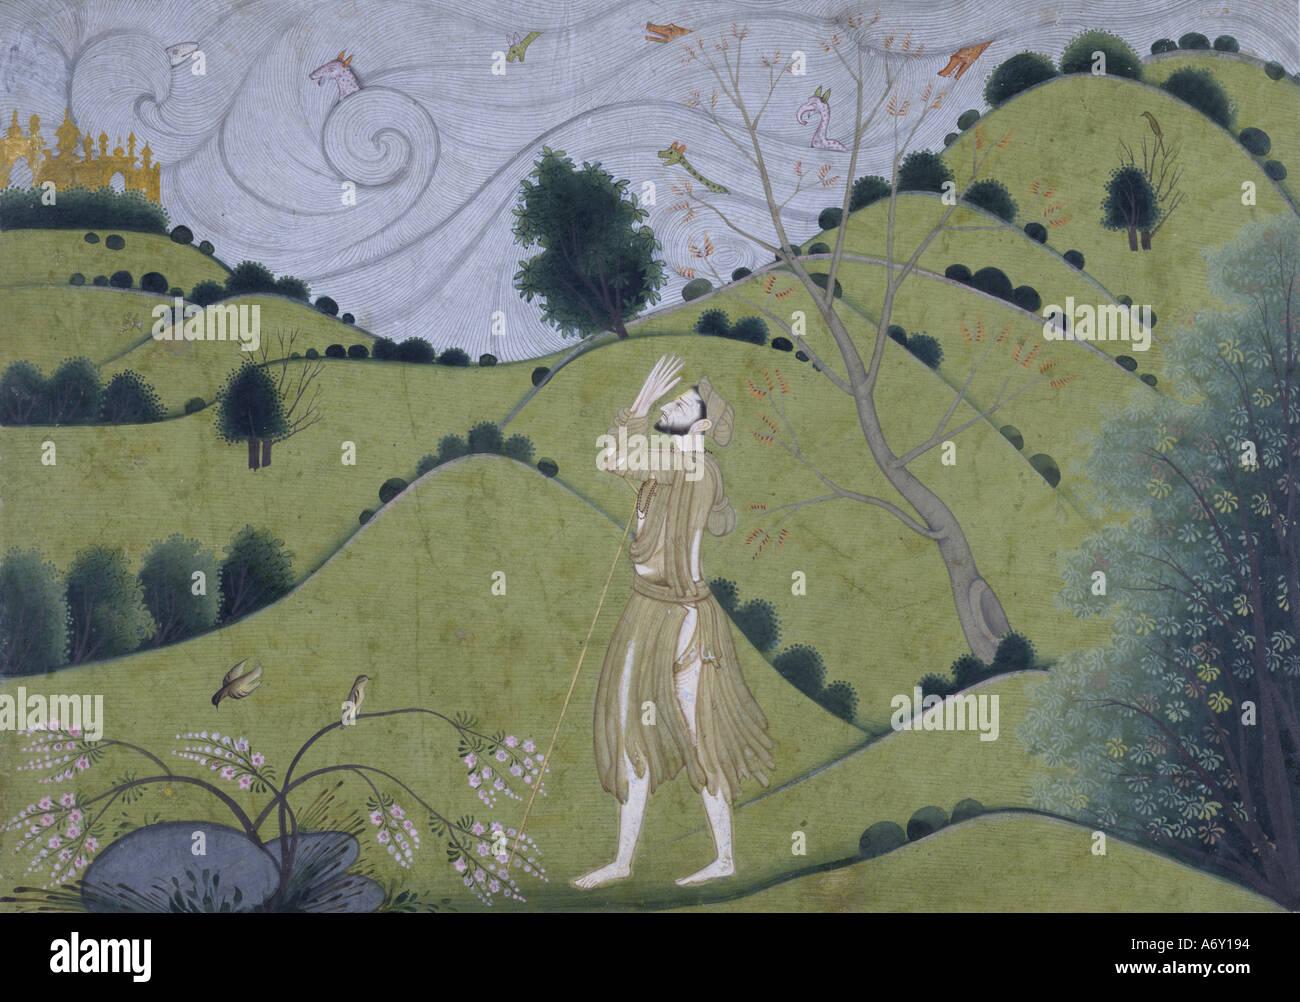 The Road to Krishna. Garwhal, Pahari, India, late 18th century. - Stock Image